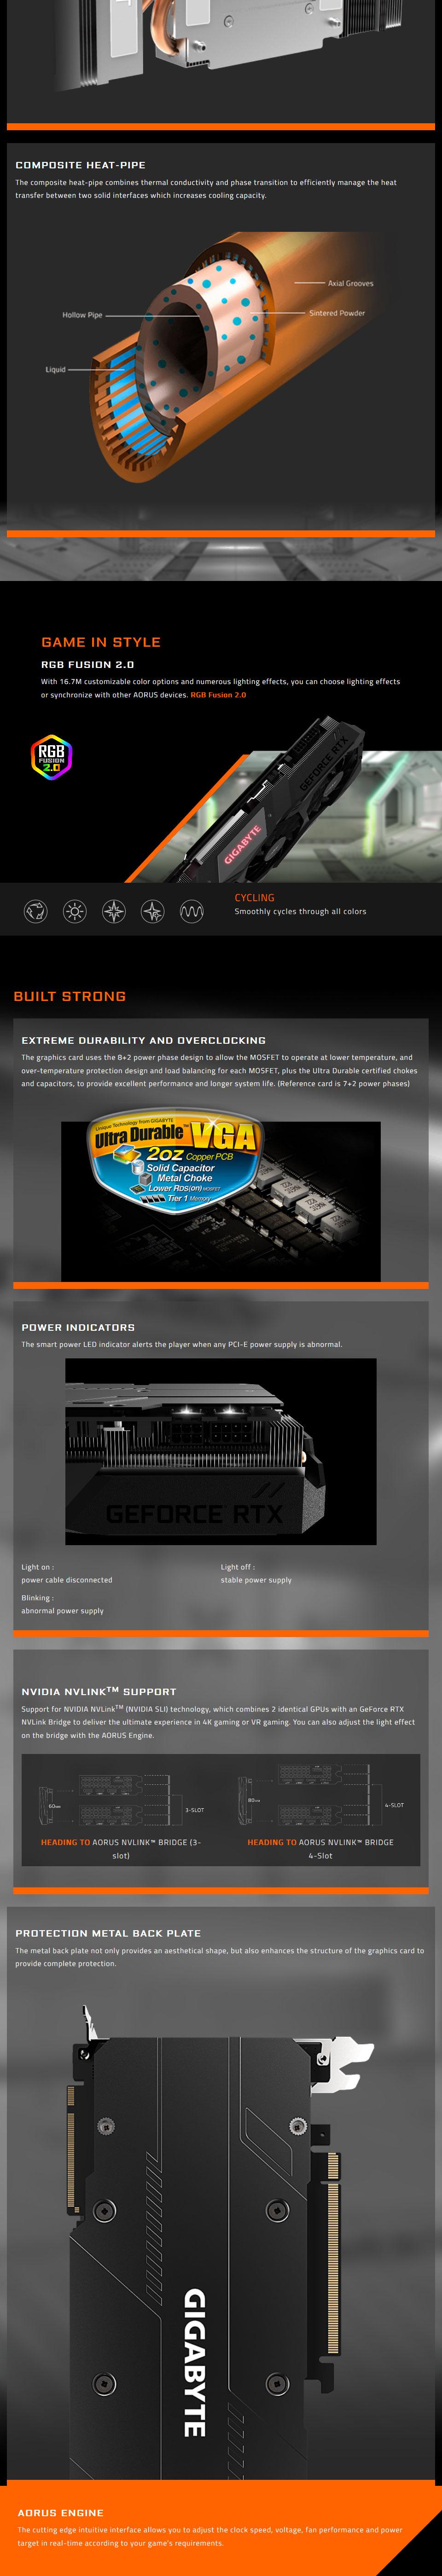 Gigabyte GeForce RTX 2070 Super Gaming OC 8GB